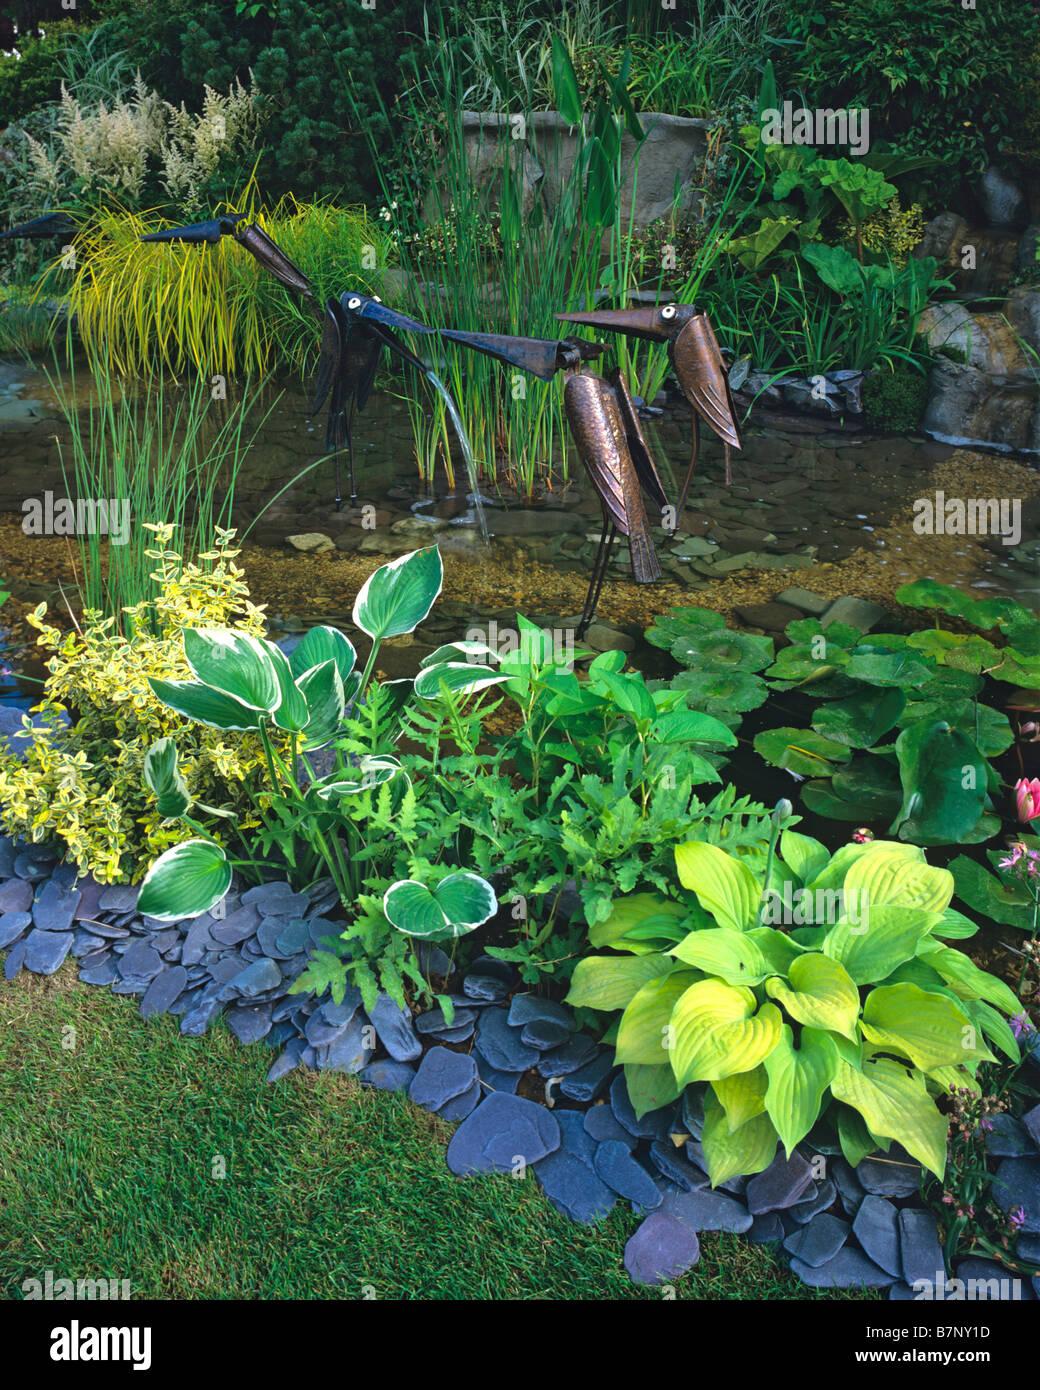 Wildlife pond with Hostas and birds sculptures - Stock Image